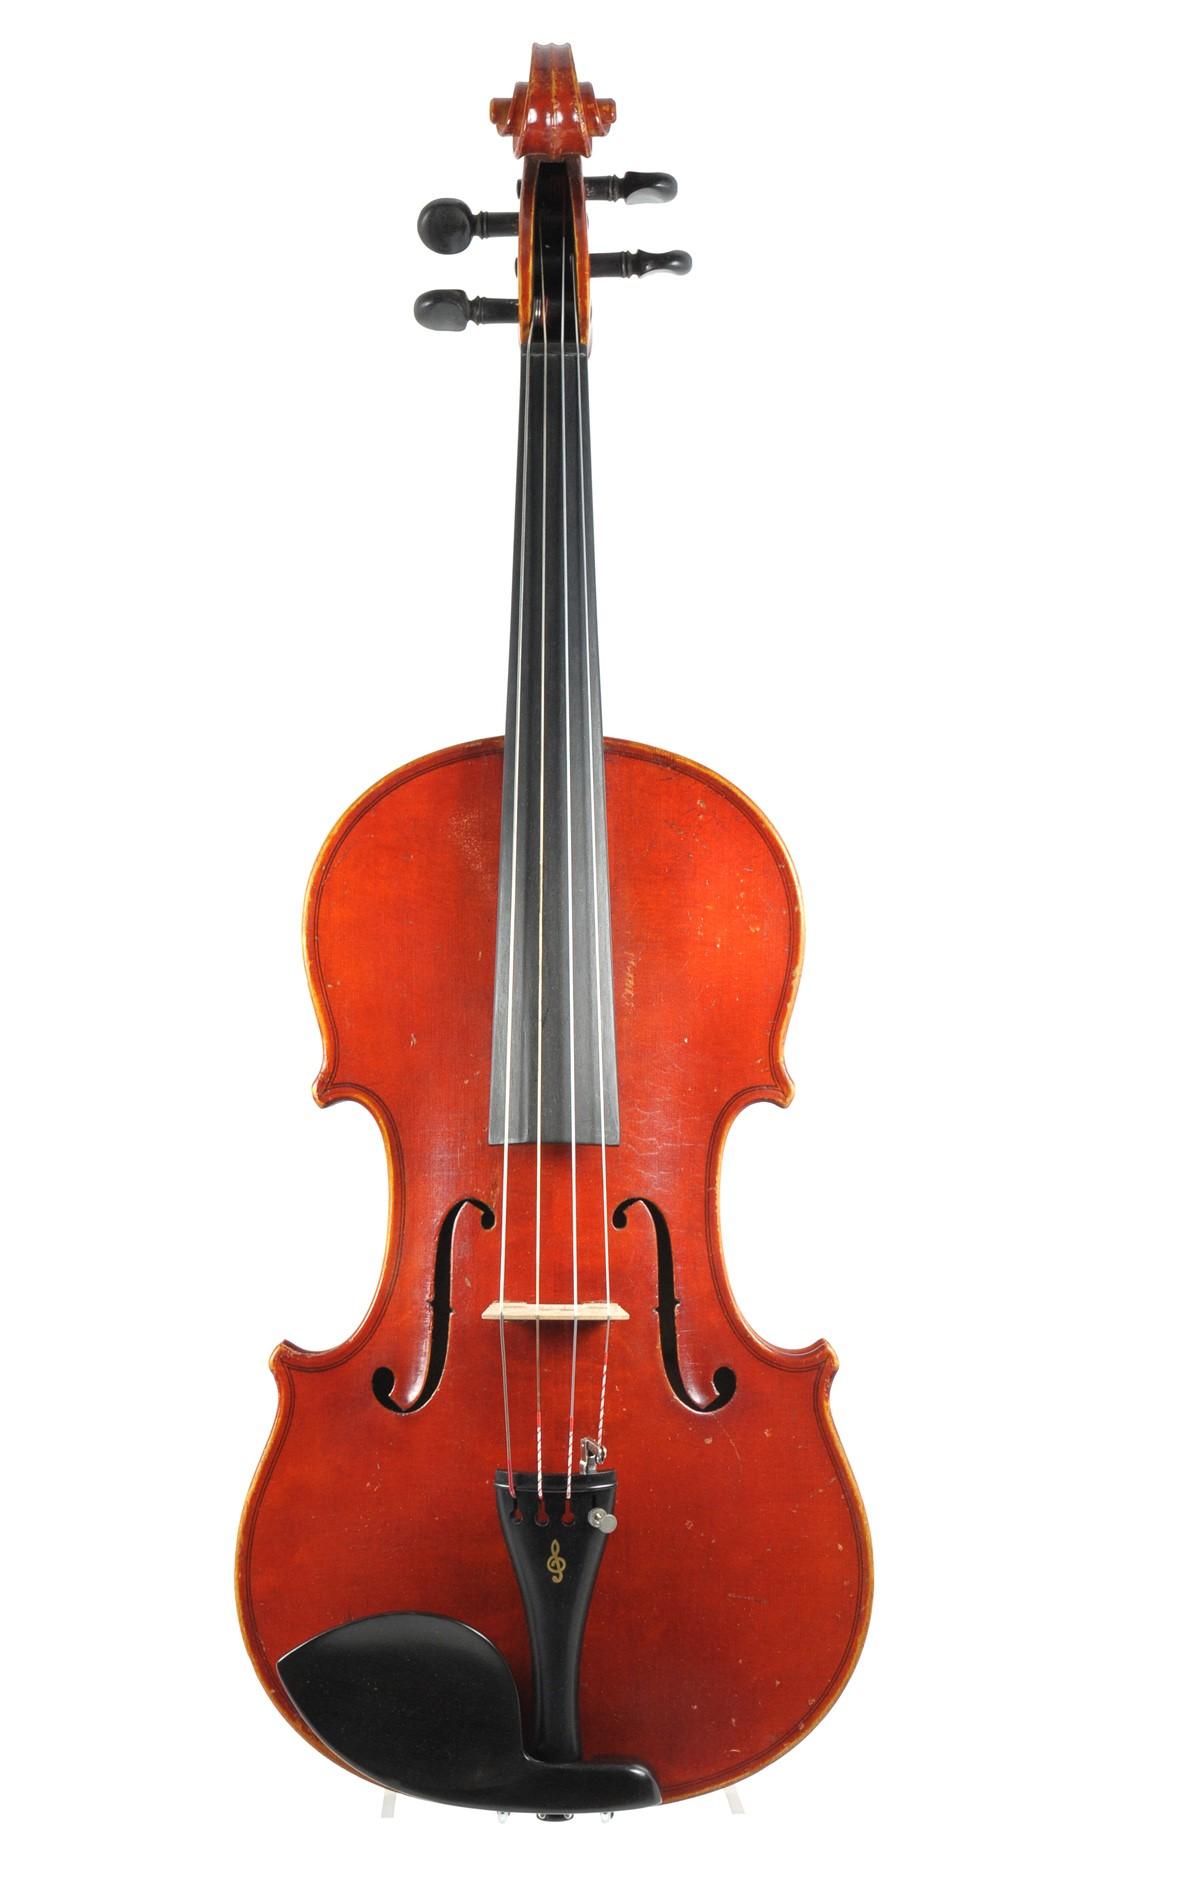 Viennese viola by Joseph Klimits